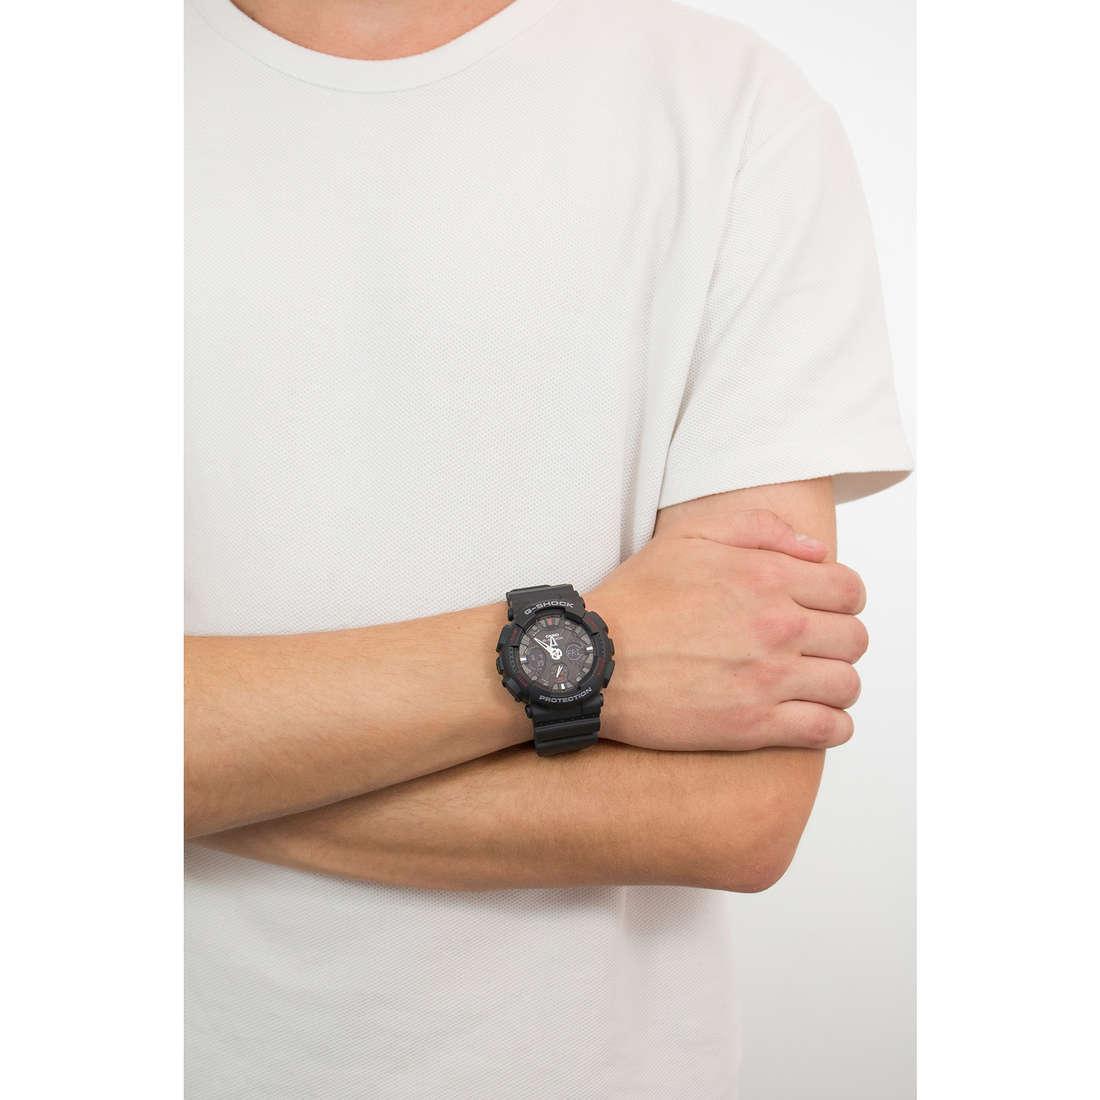 Casio digitali G-Shock uomo GA-120-1AER indosso